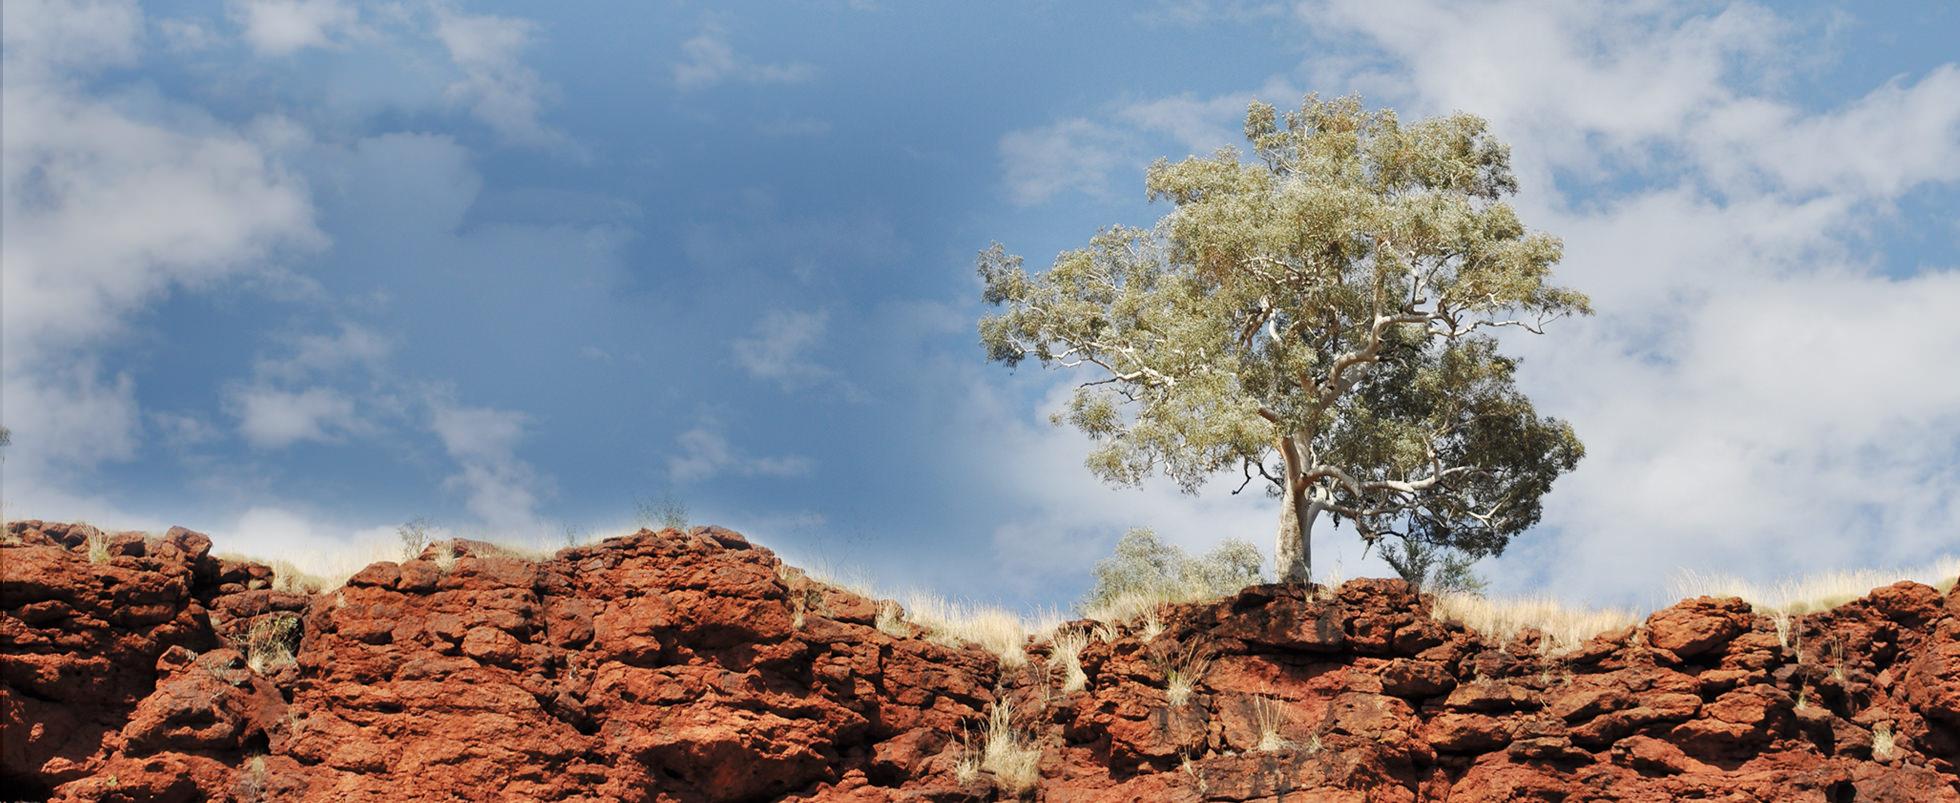 tree-on-cliff